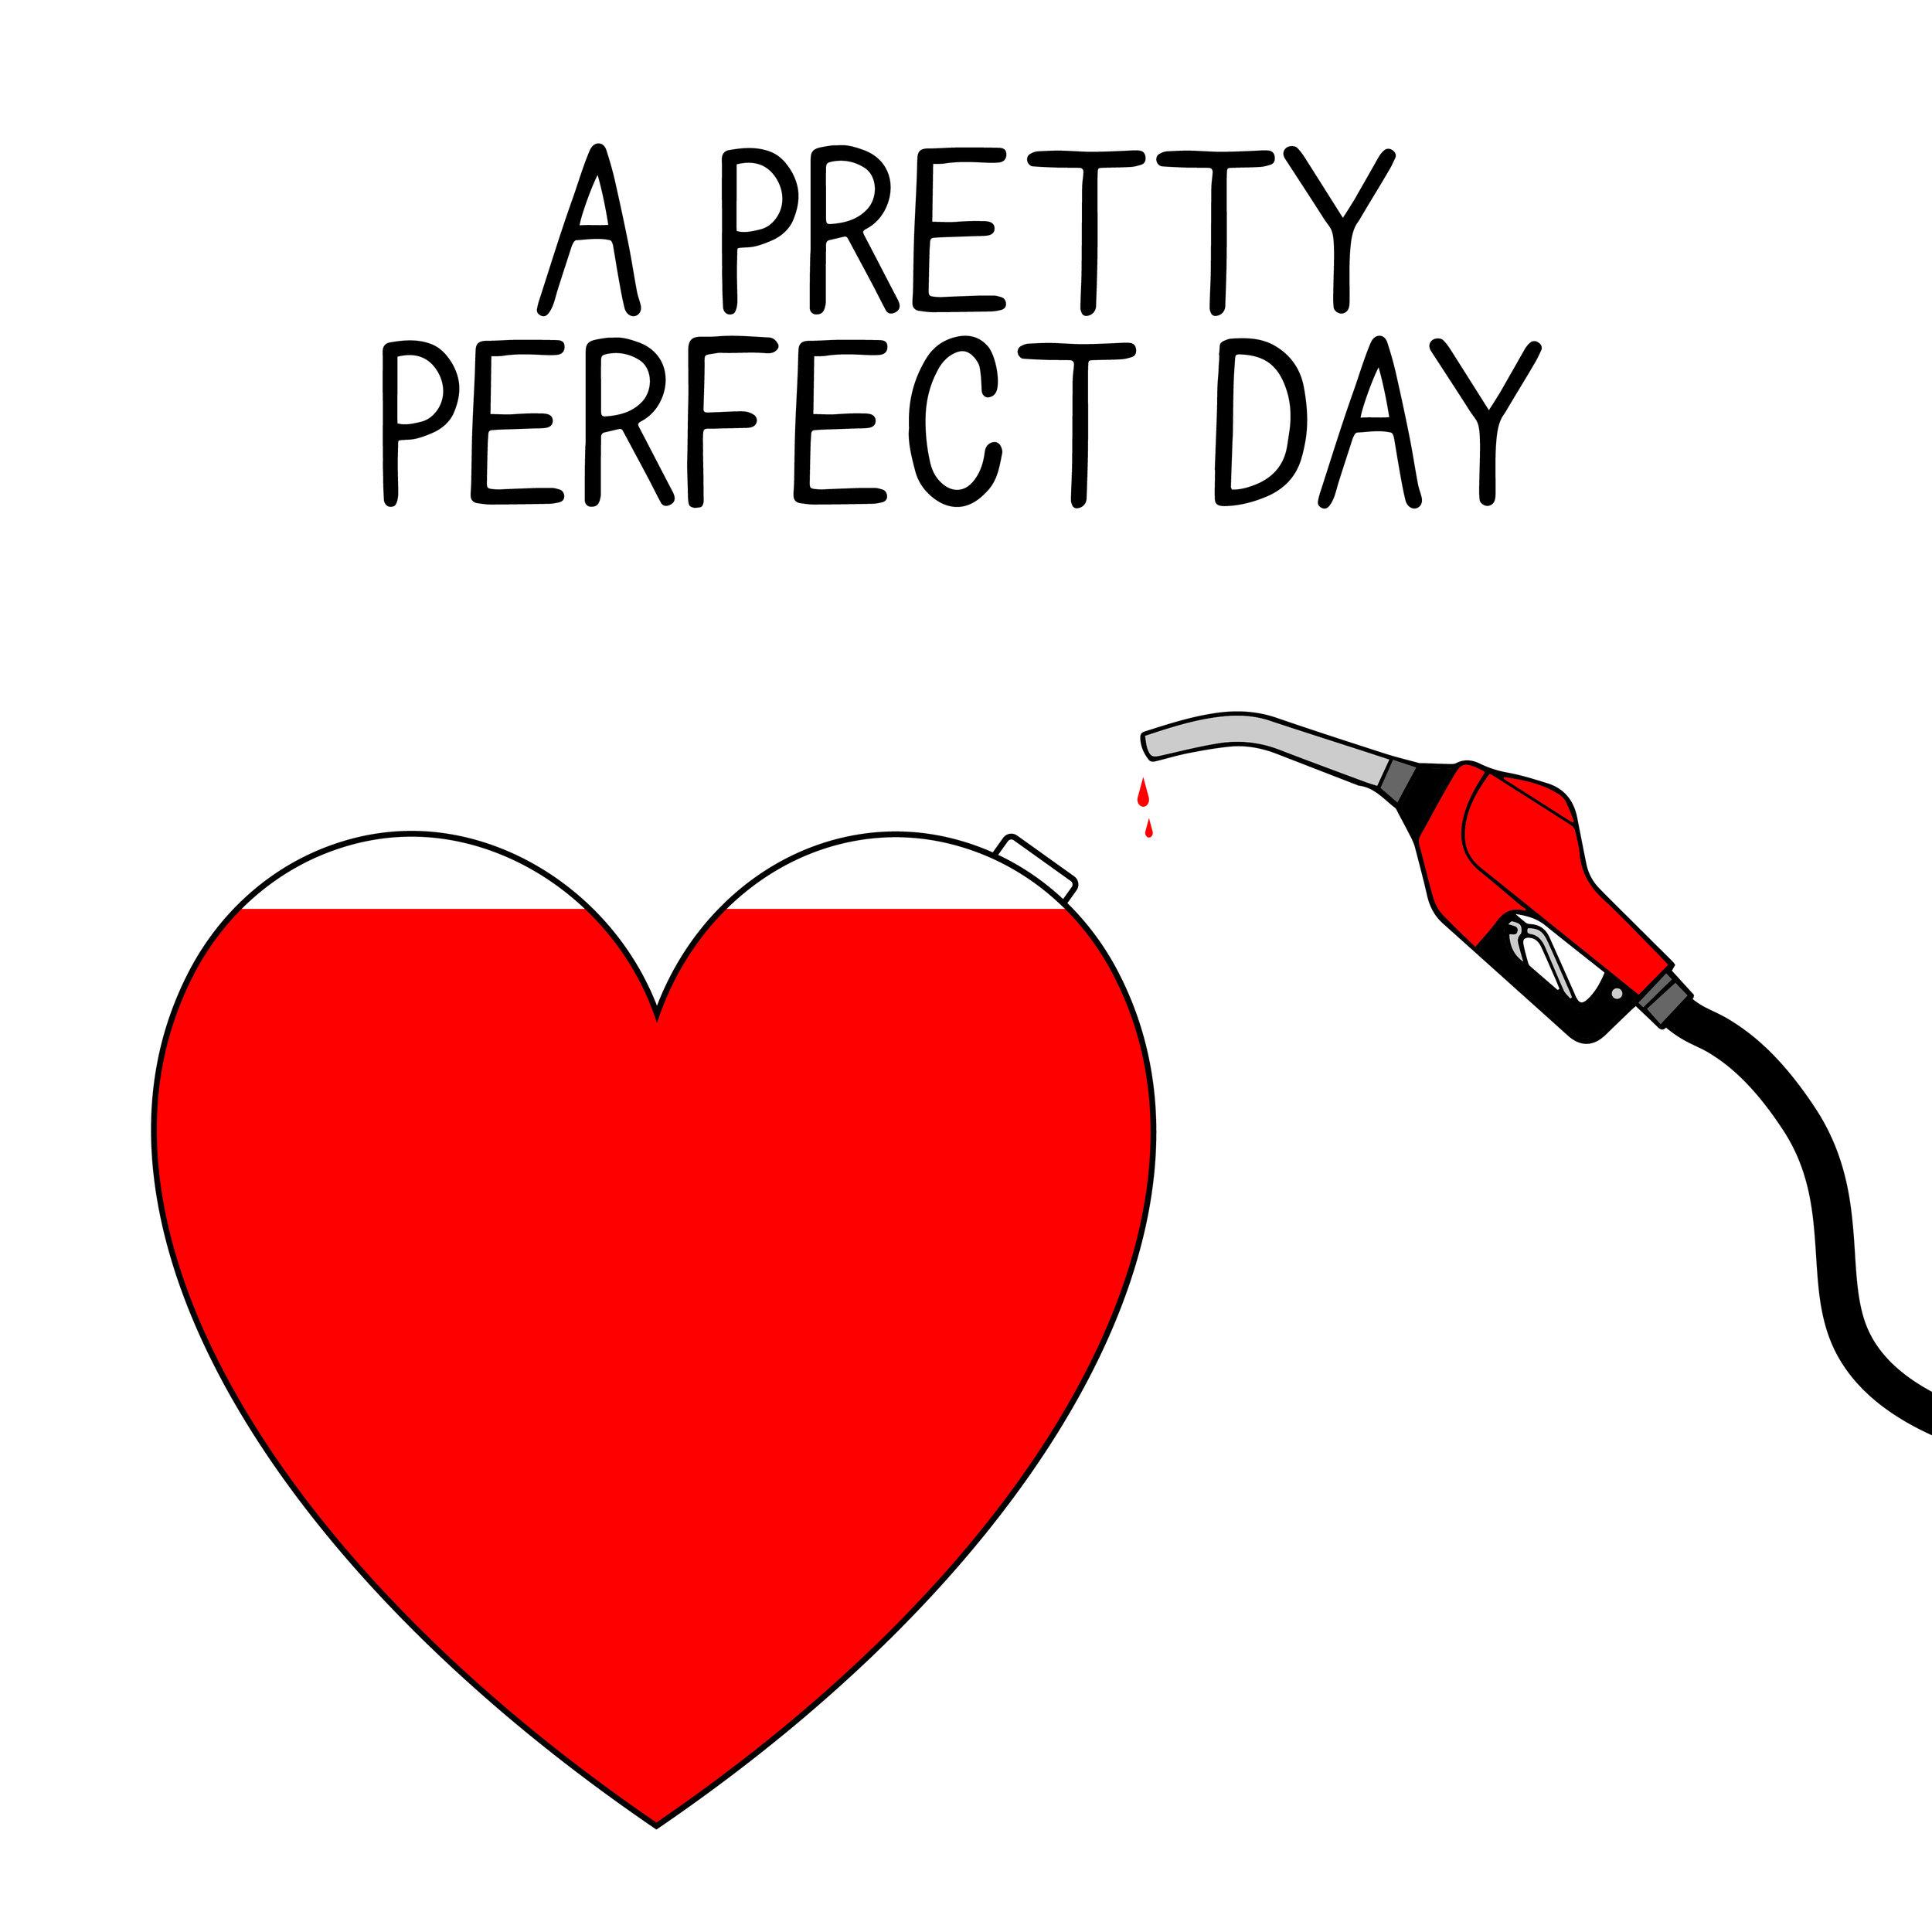 aprettyperfectday-01.jpg